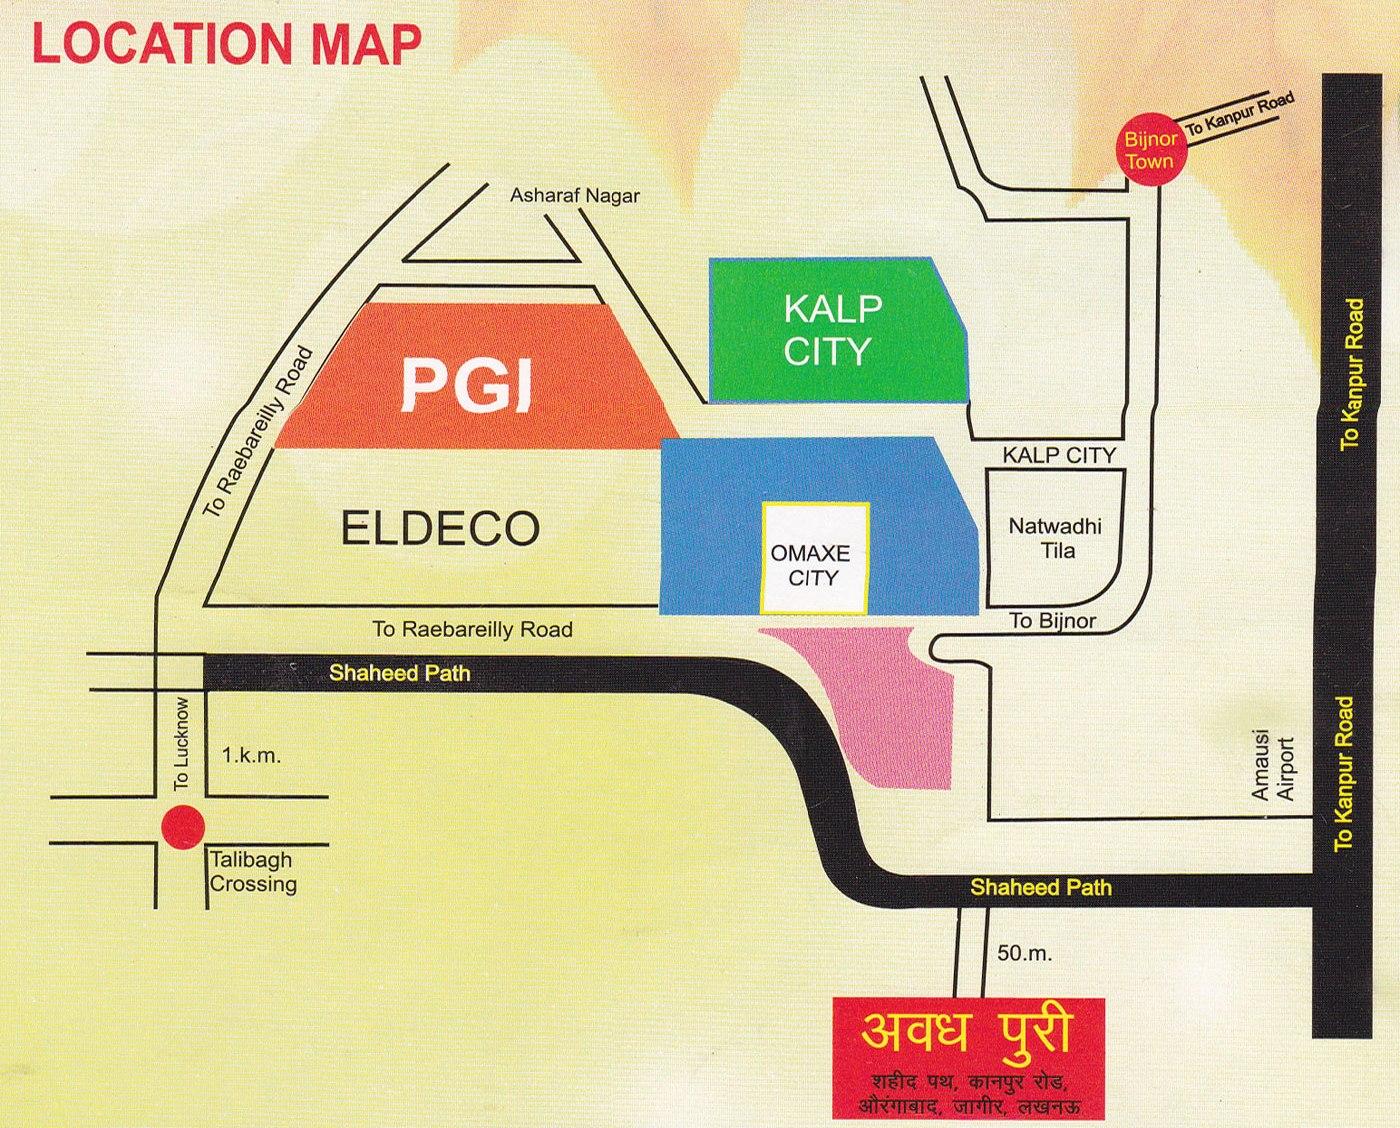 Awadhpuri_Location_Map.jpg